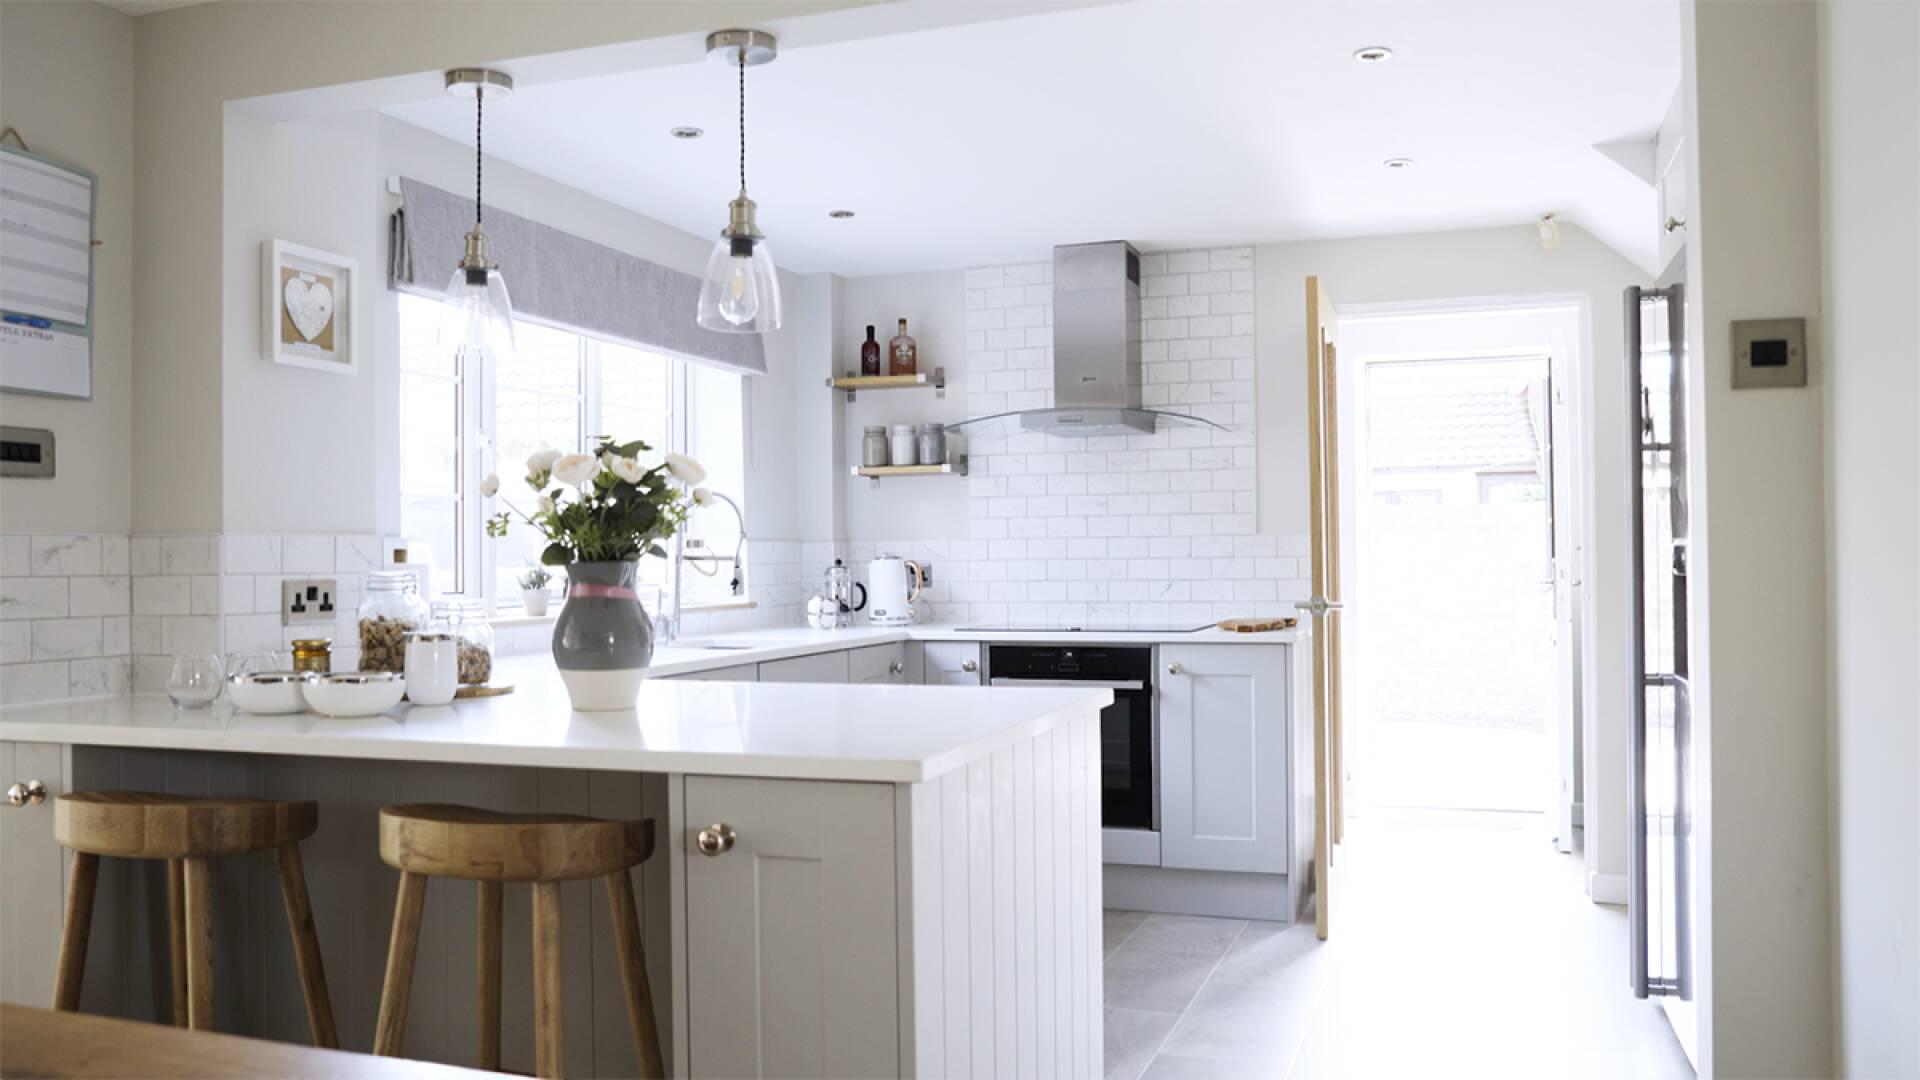 Claire's kitchen